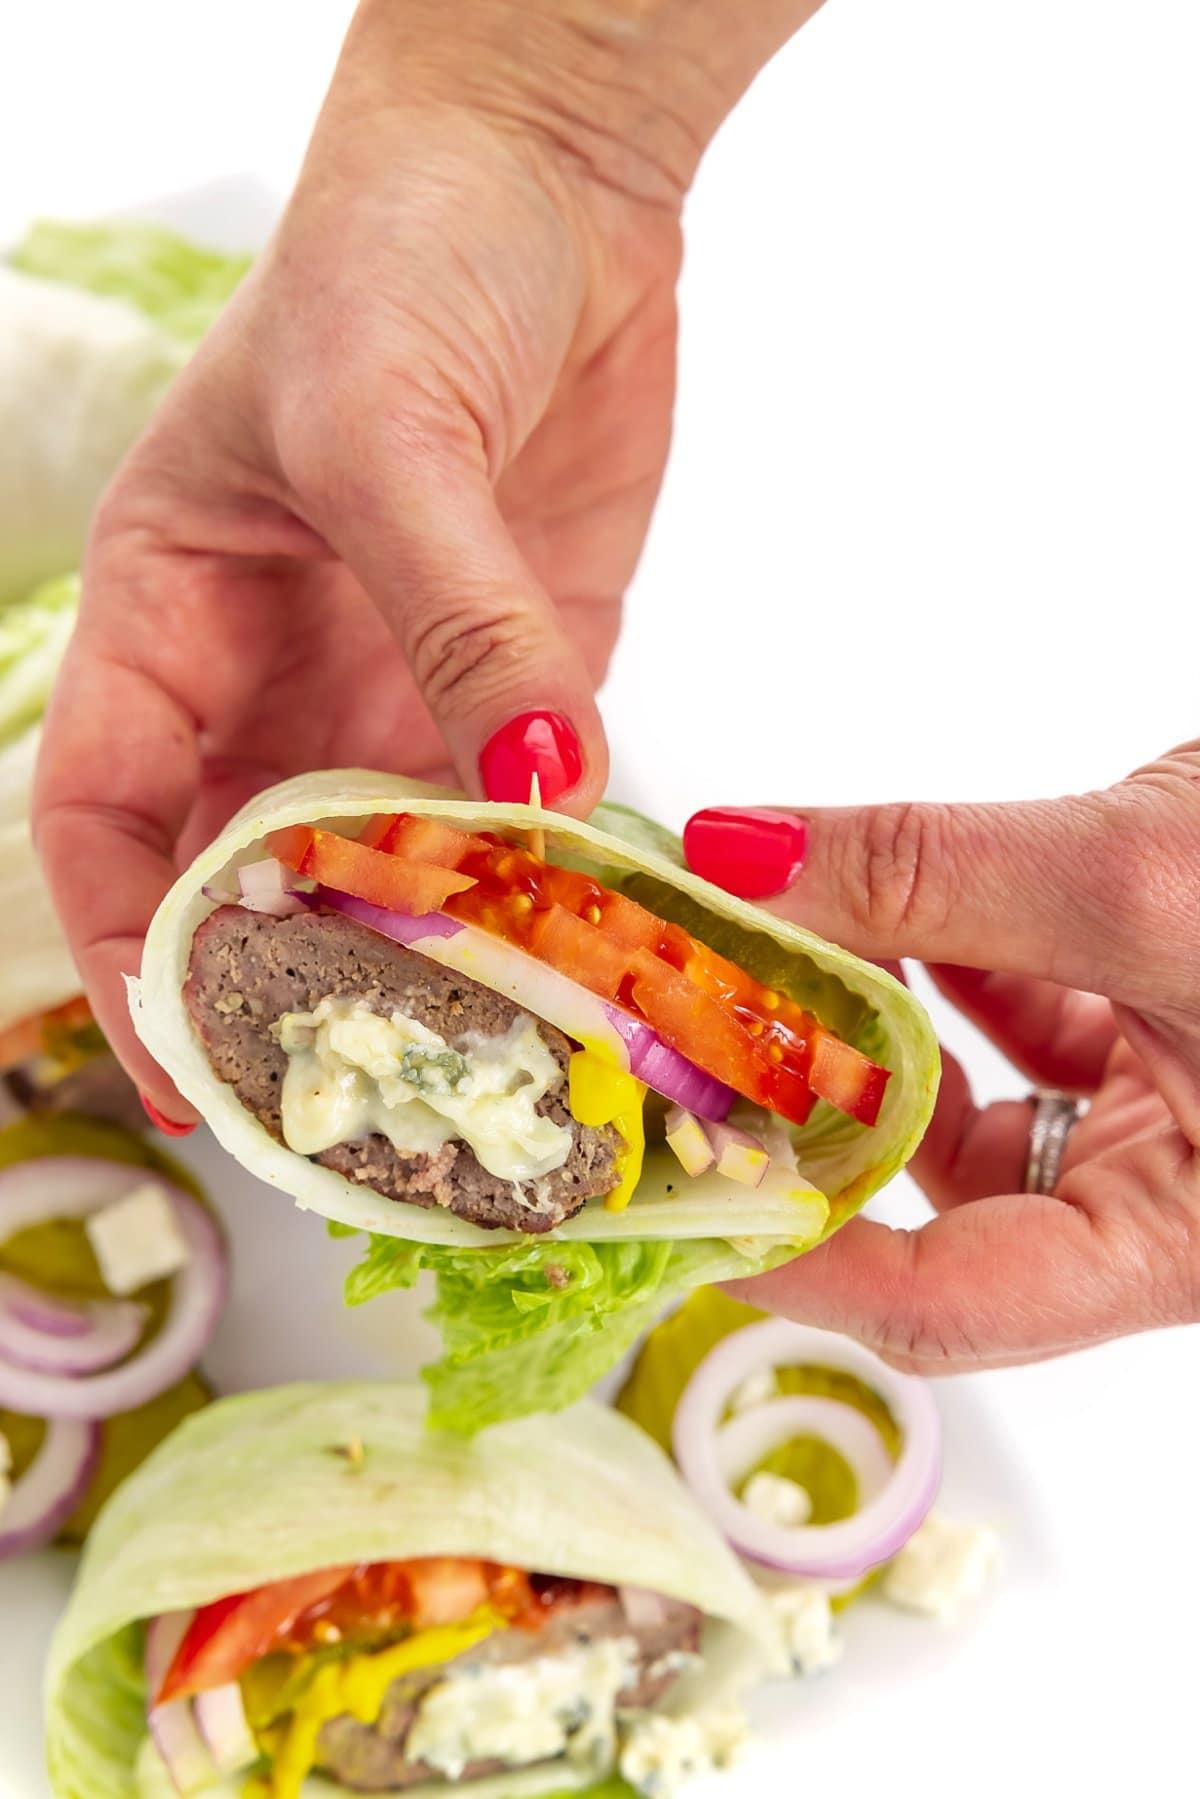 Low carb burgers